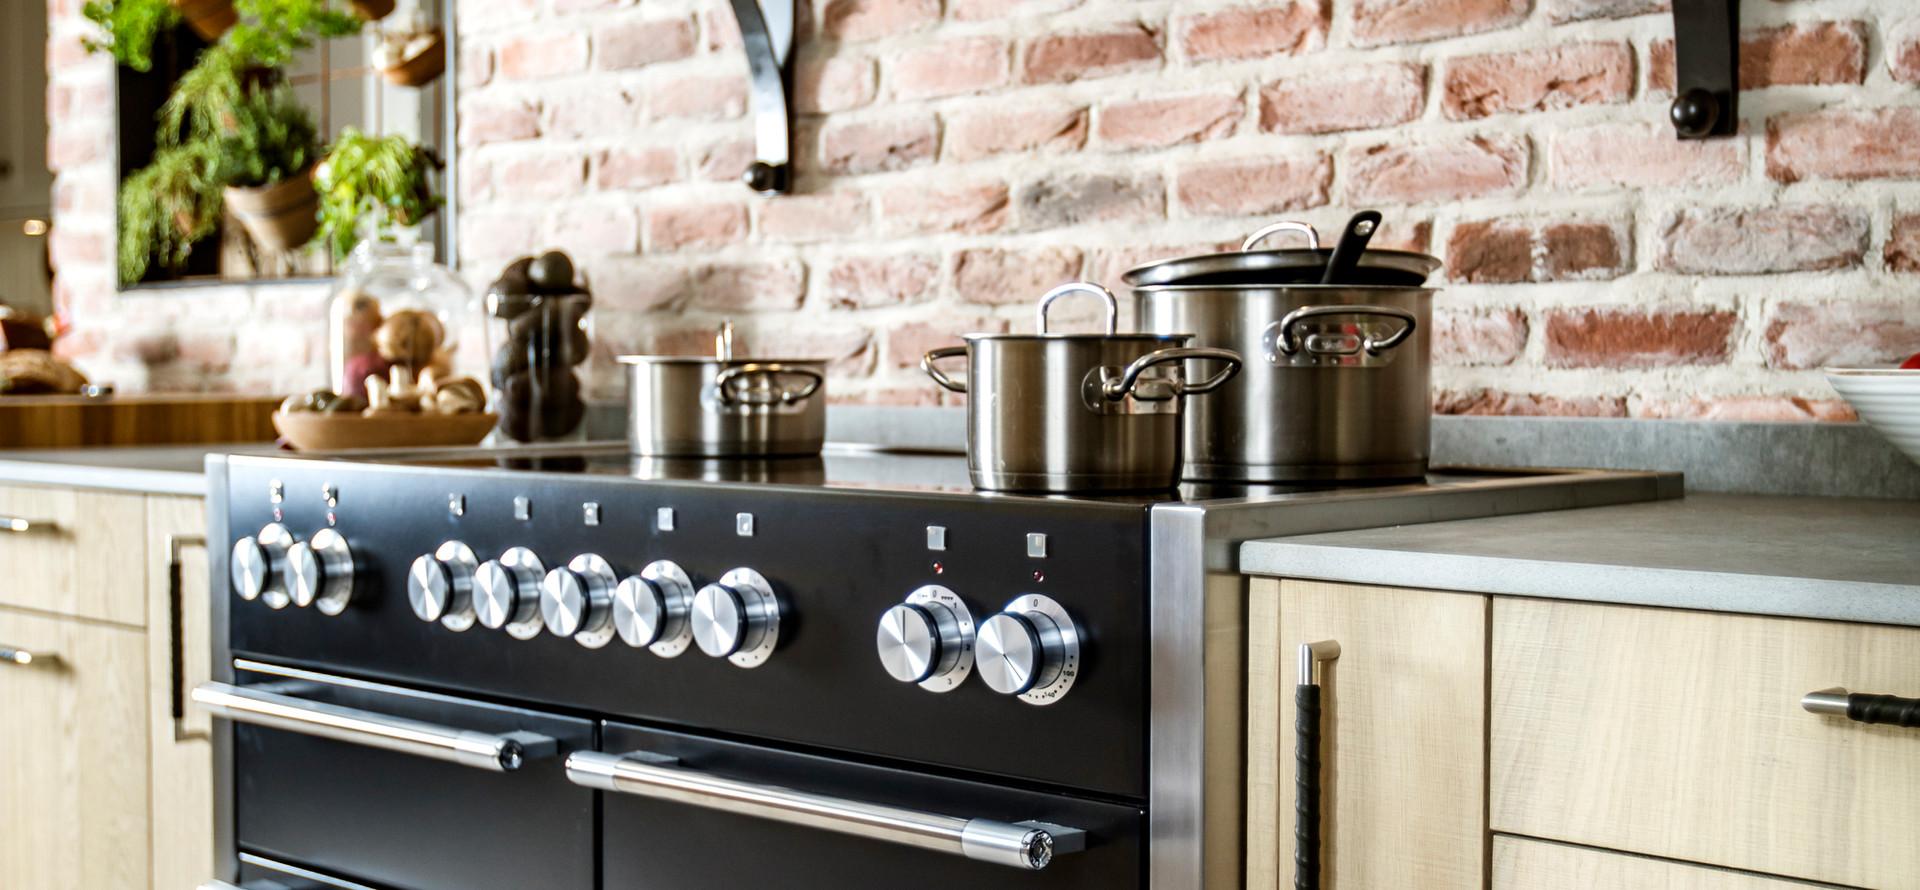 Mercury spis 1200  -Ett smycke i köket